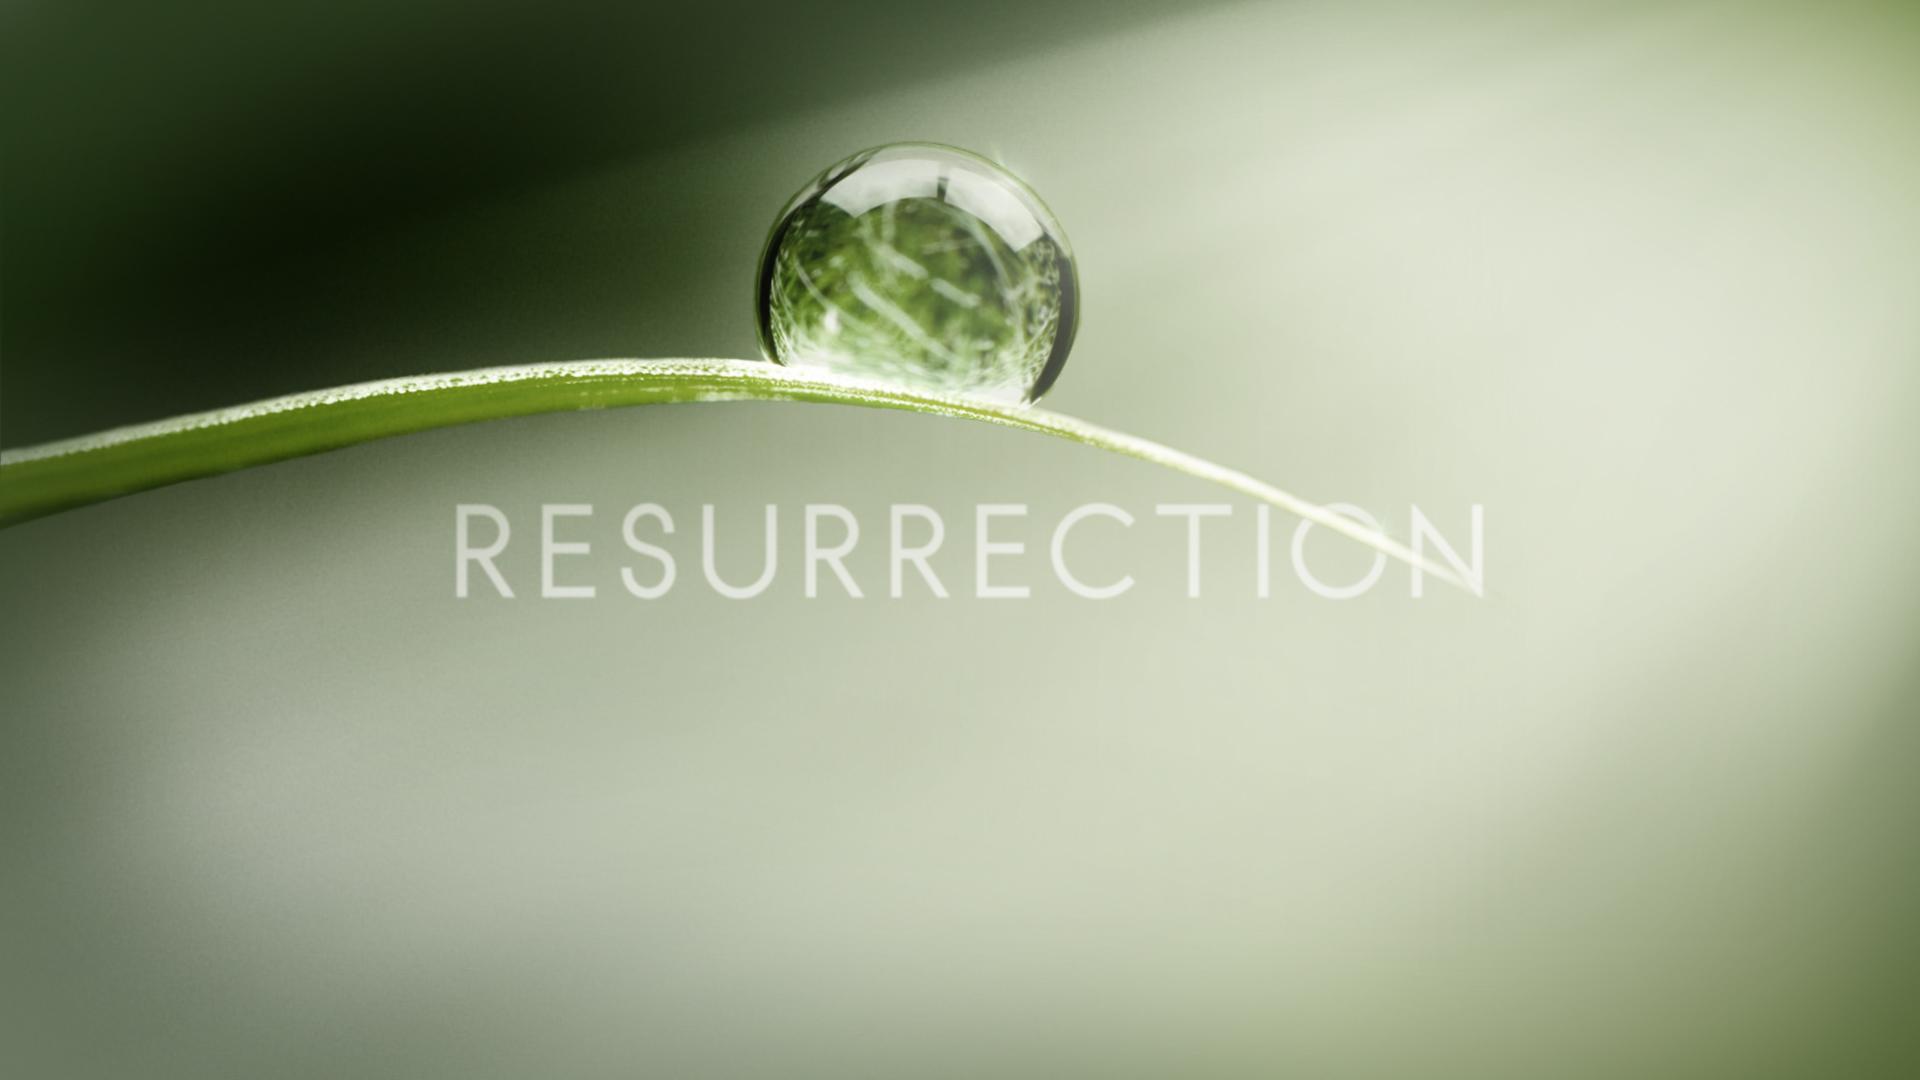 Resurrection logo #ABCTVEvent